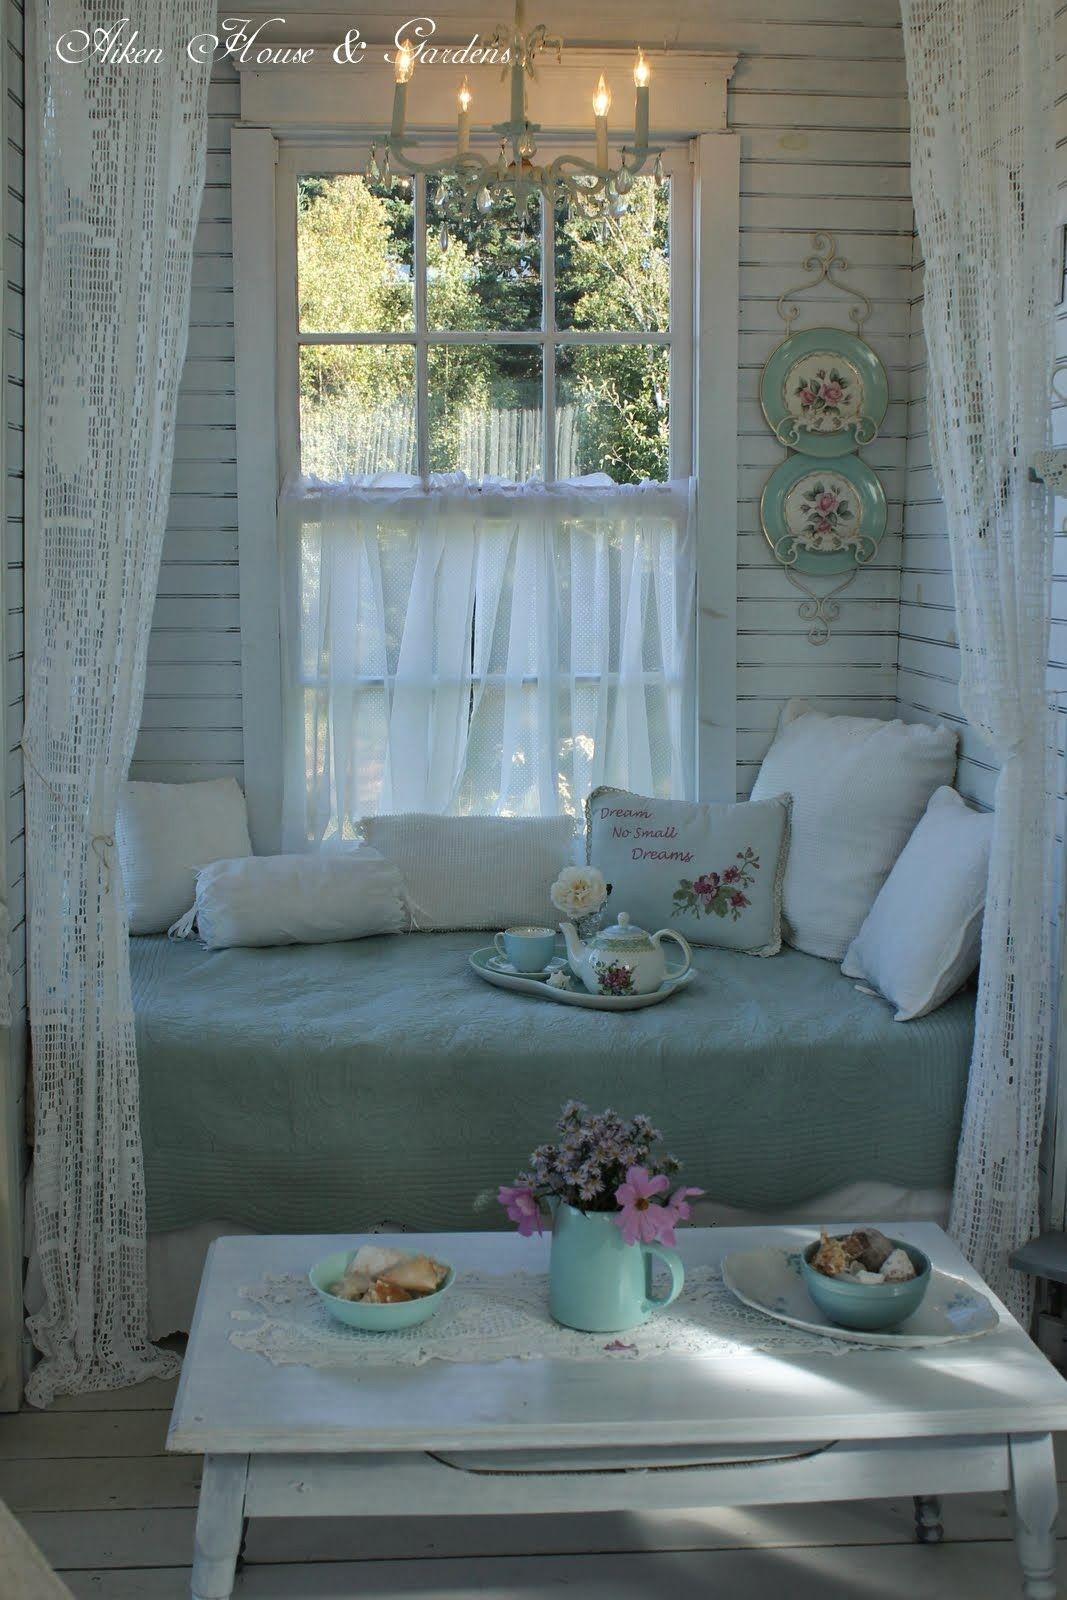 Window nook decorating ideas  pin by elsie figueroa on new home ideas  pinterest  boathouse